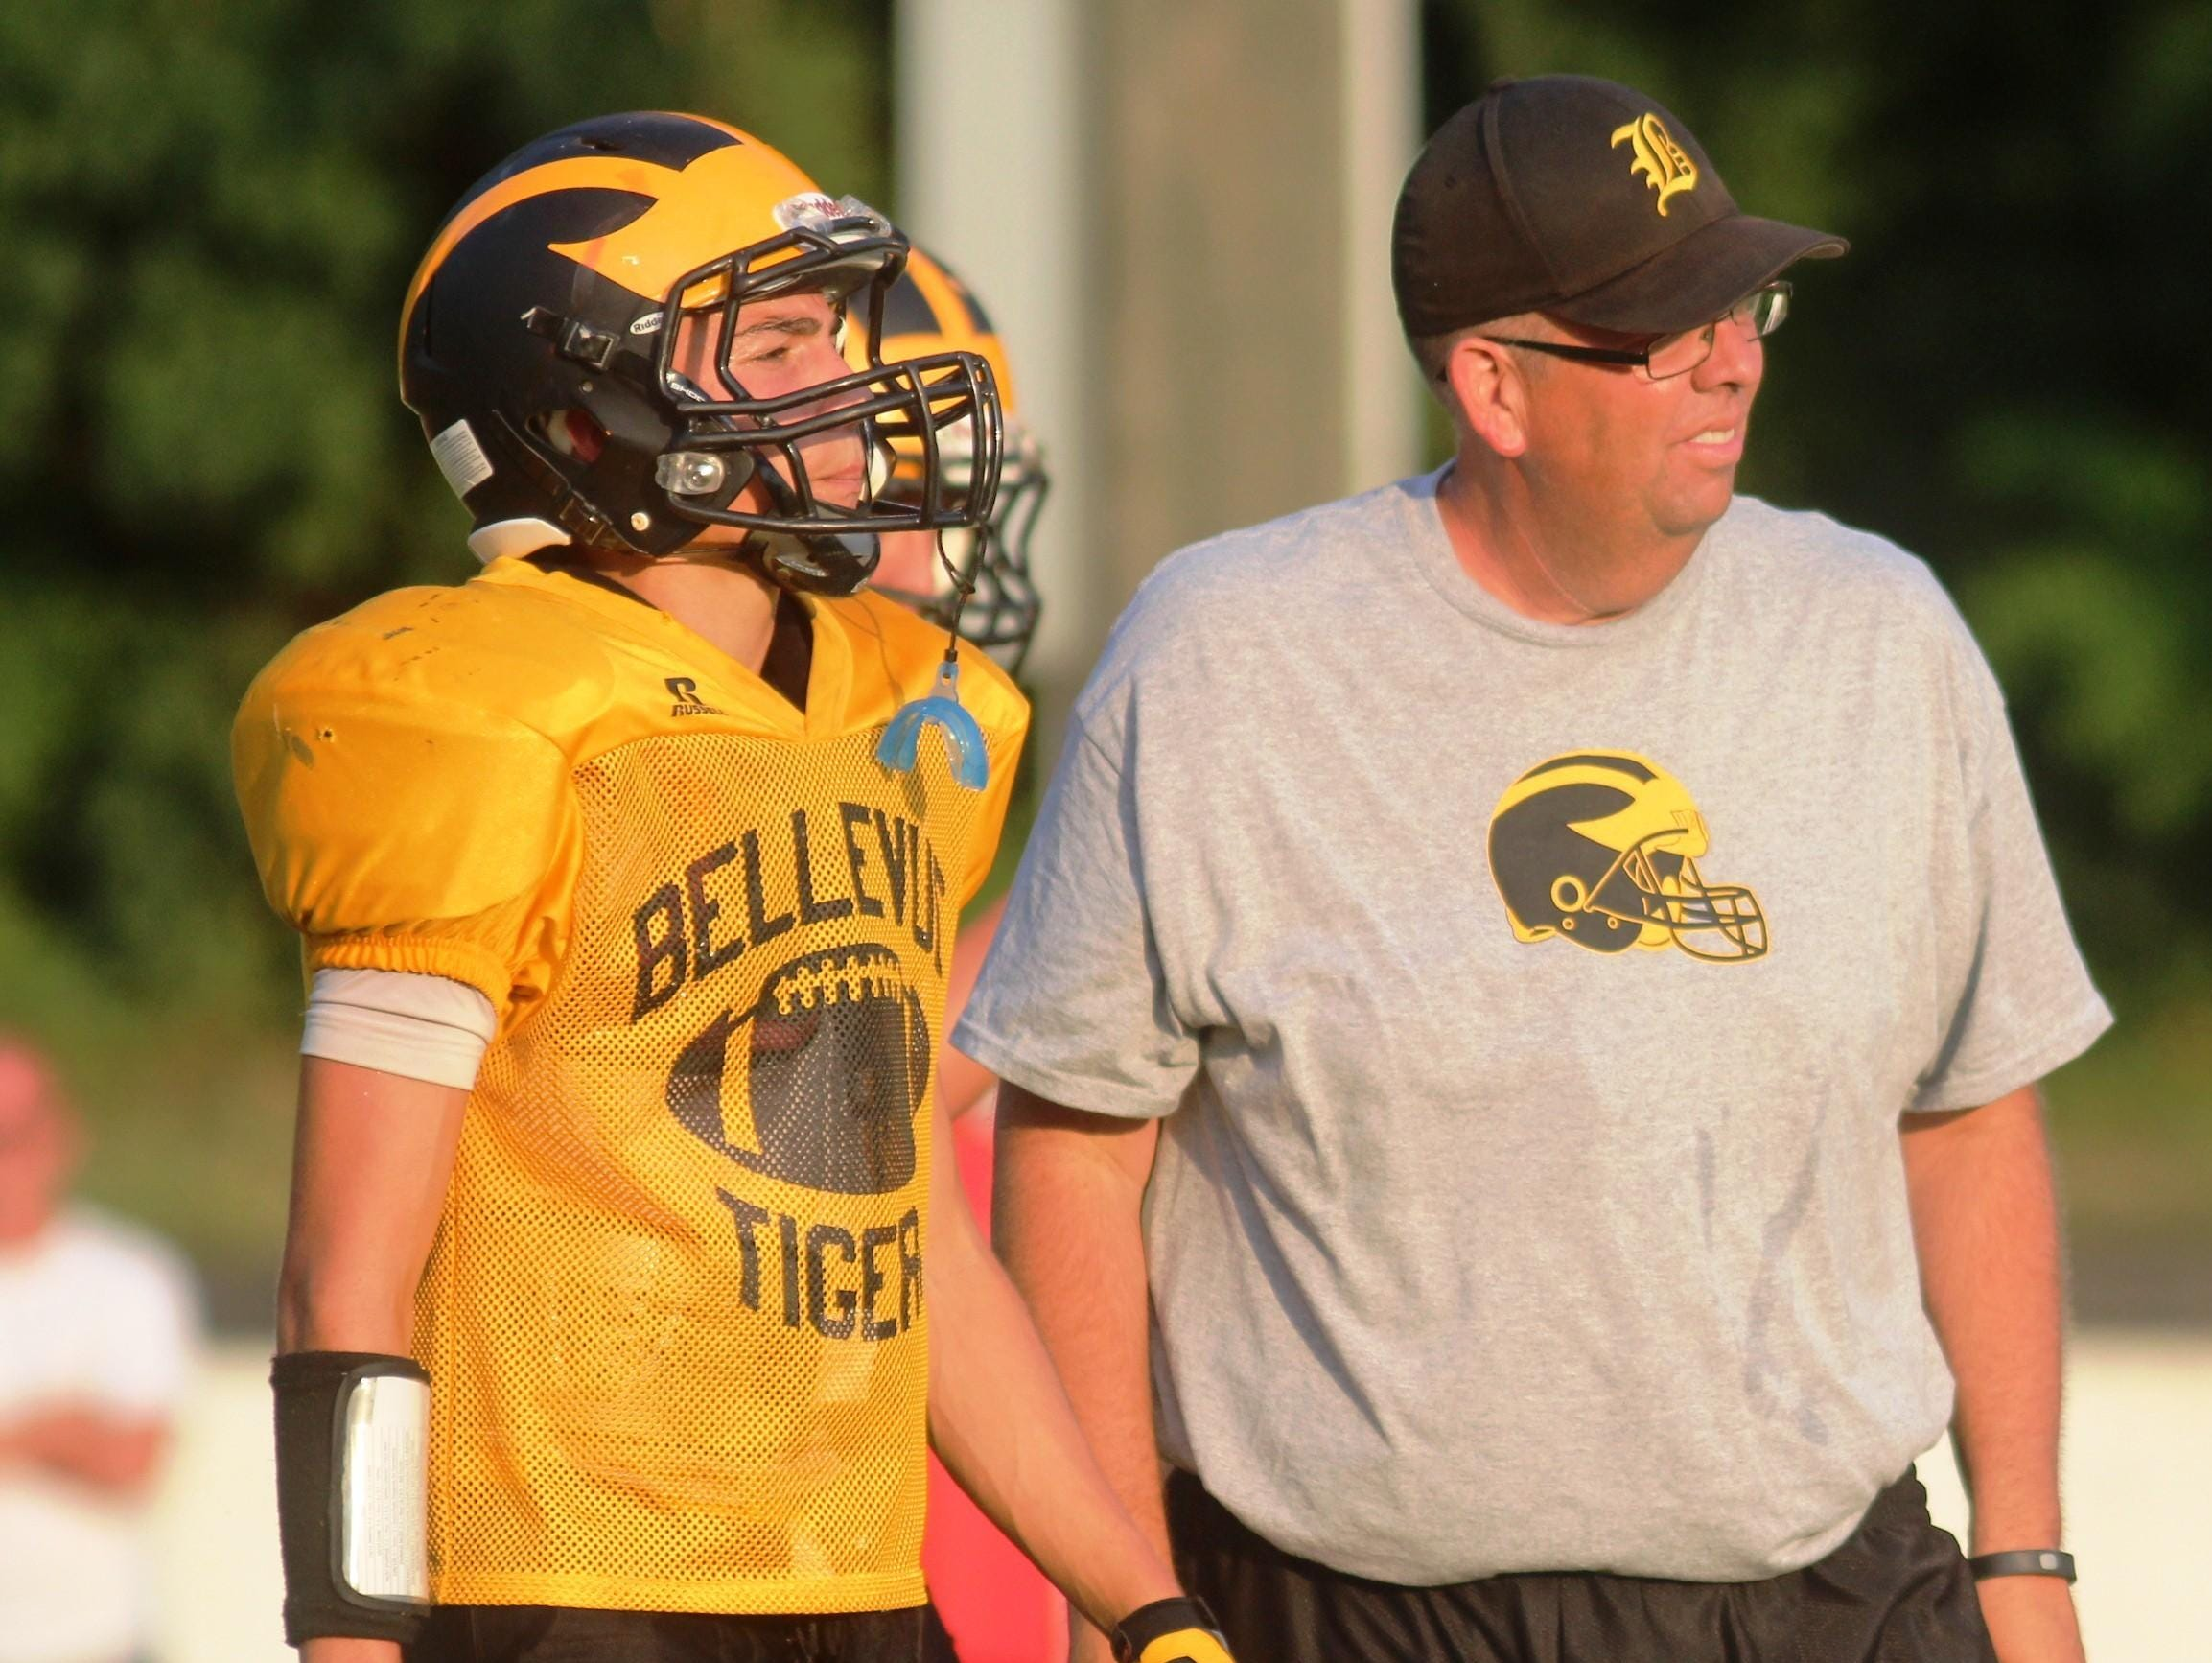 Bellevue head coach Woody McMillen watches the scrimmage.